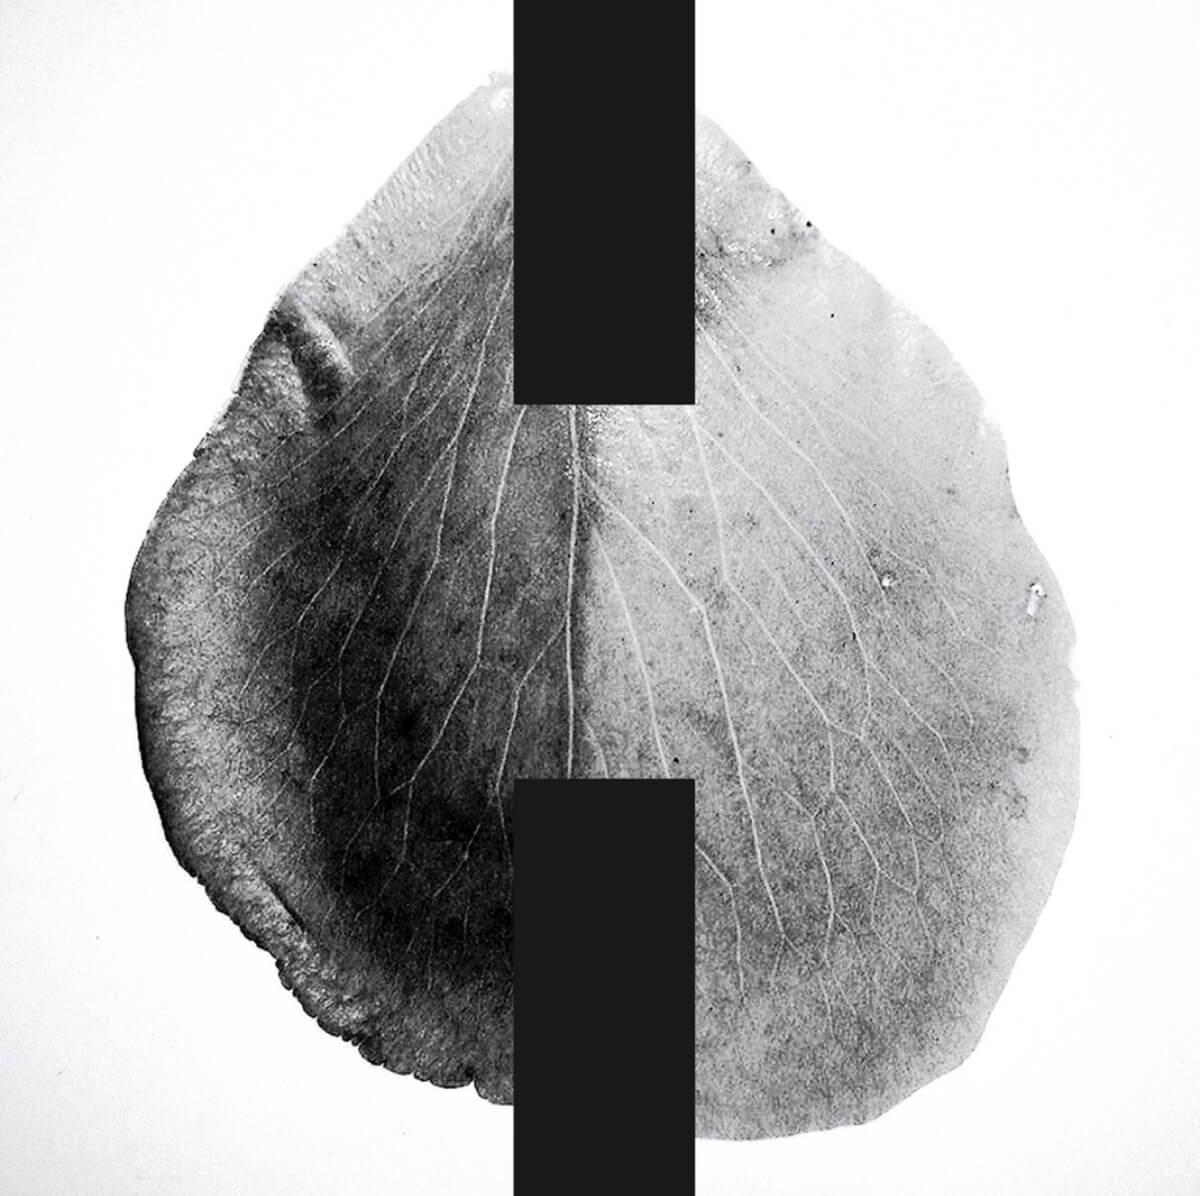 rachela abbate Rose-_2-_-herbarium-series-by-rachela-Abbaet herbarium